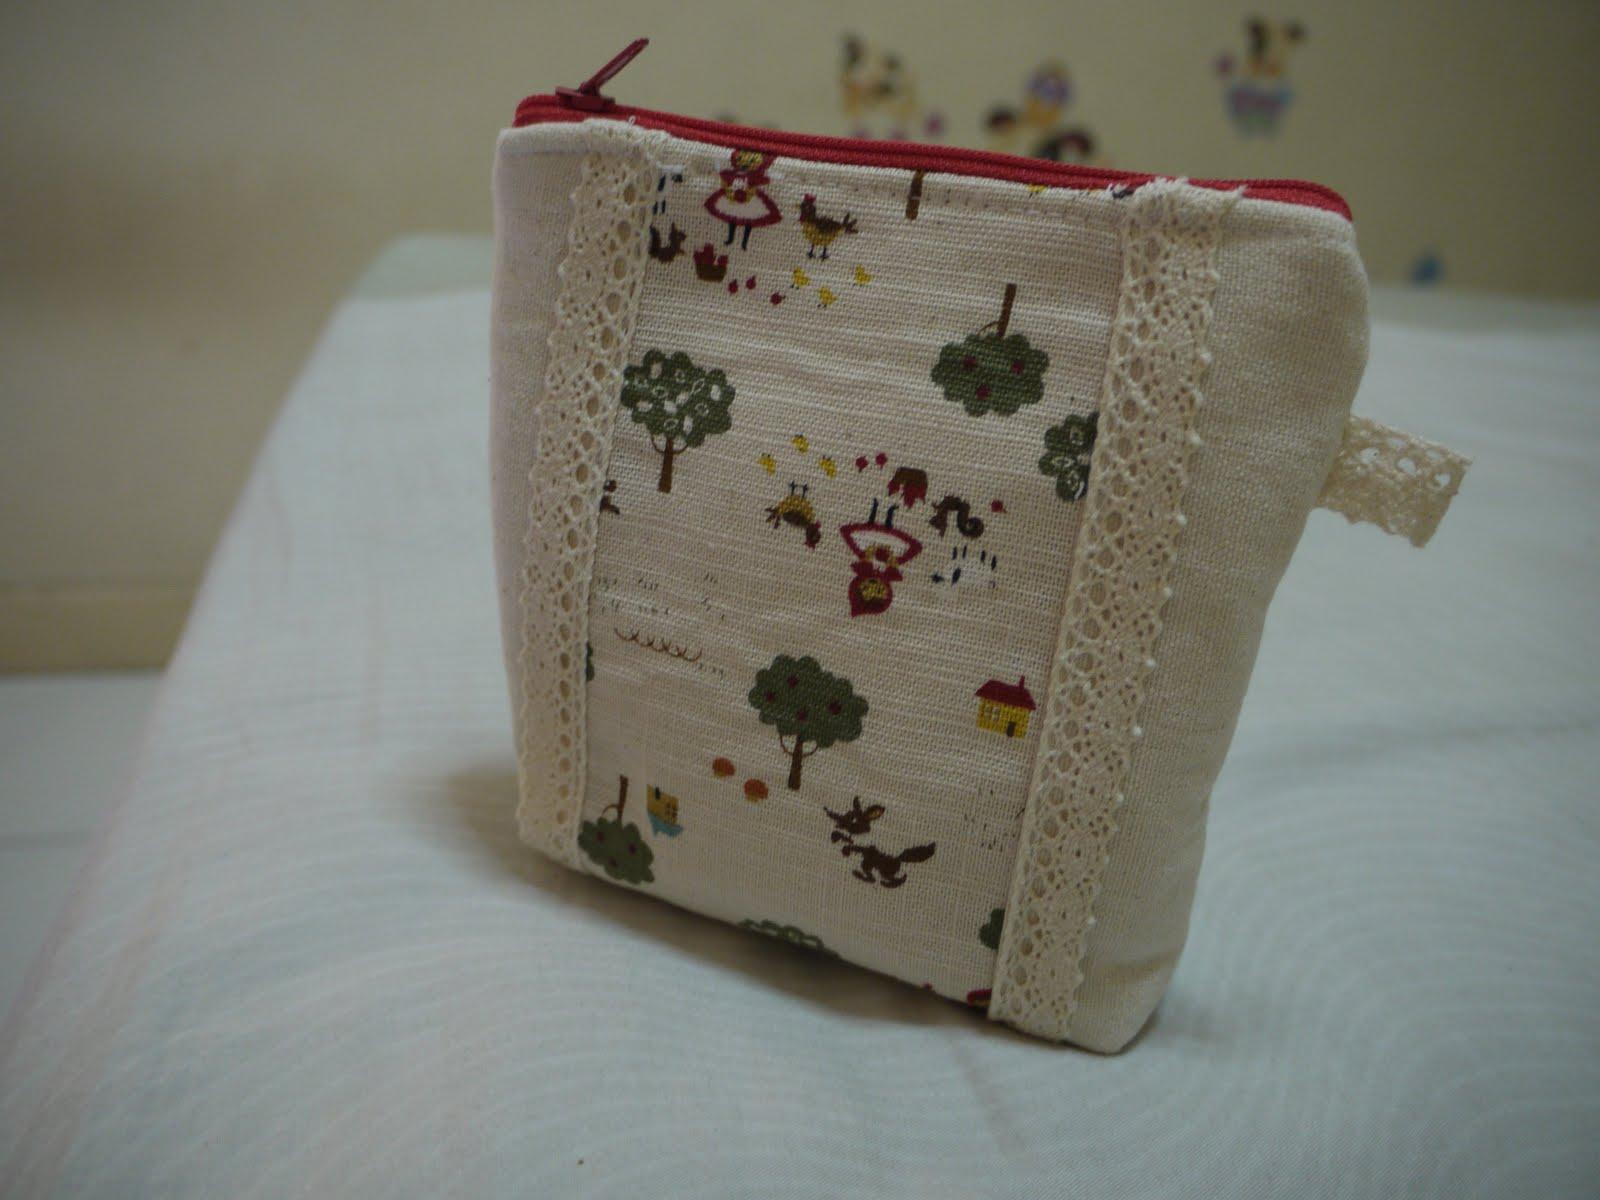 fabrics + sewing: 送給朋友的圣誕禮物-化妝包